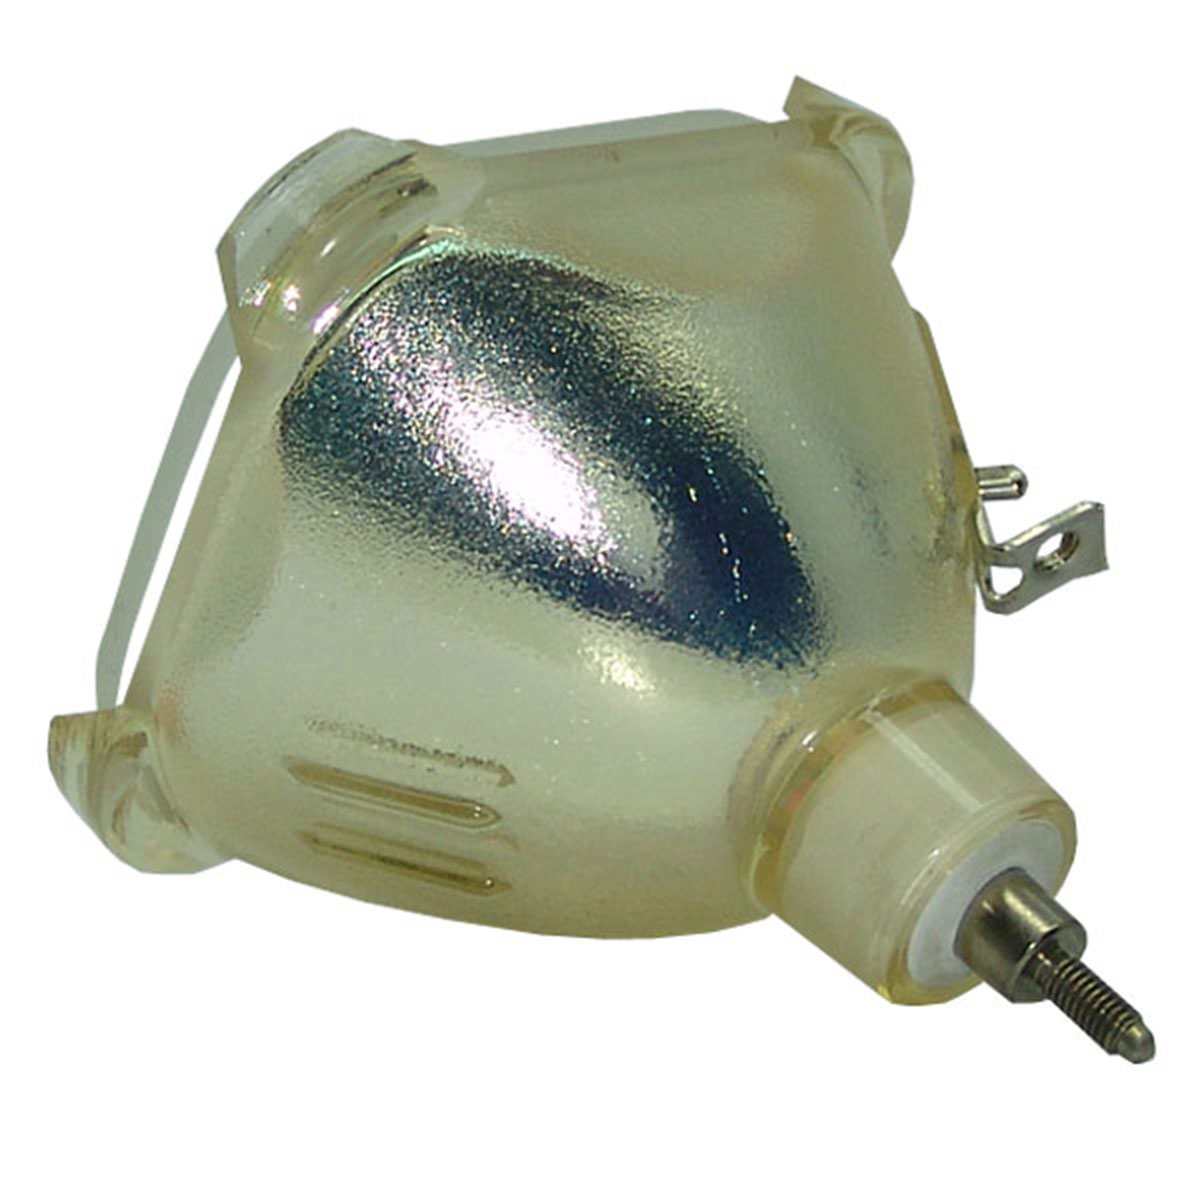 Original Philips Projector Lamp Replacement for InFocus LP690 (Bulb Only) - image 3 de 5